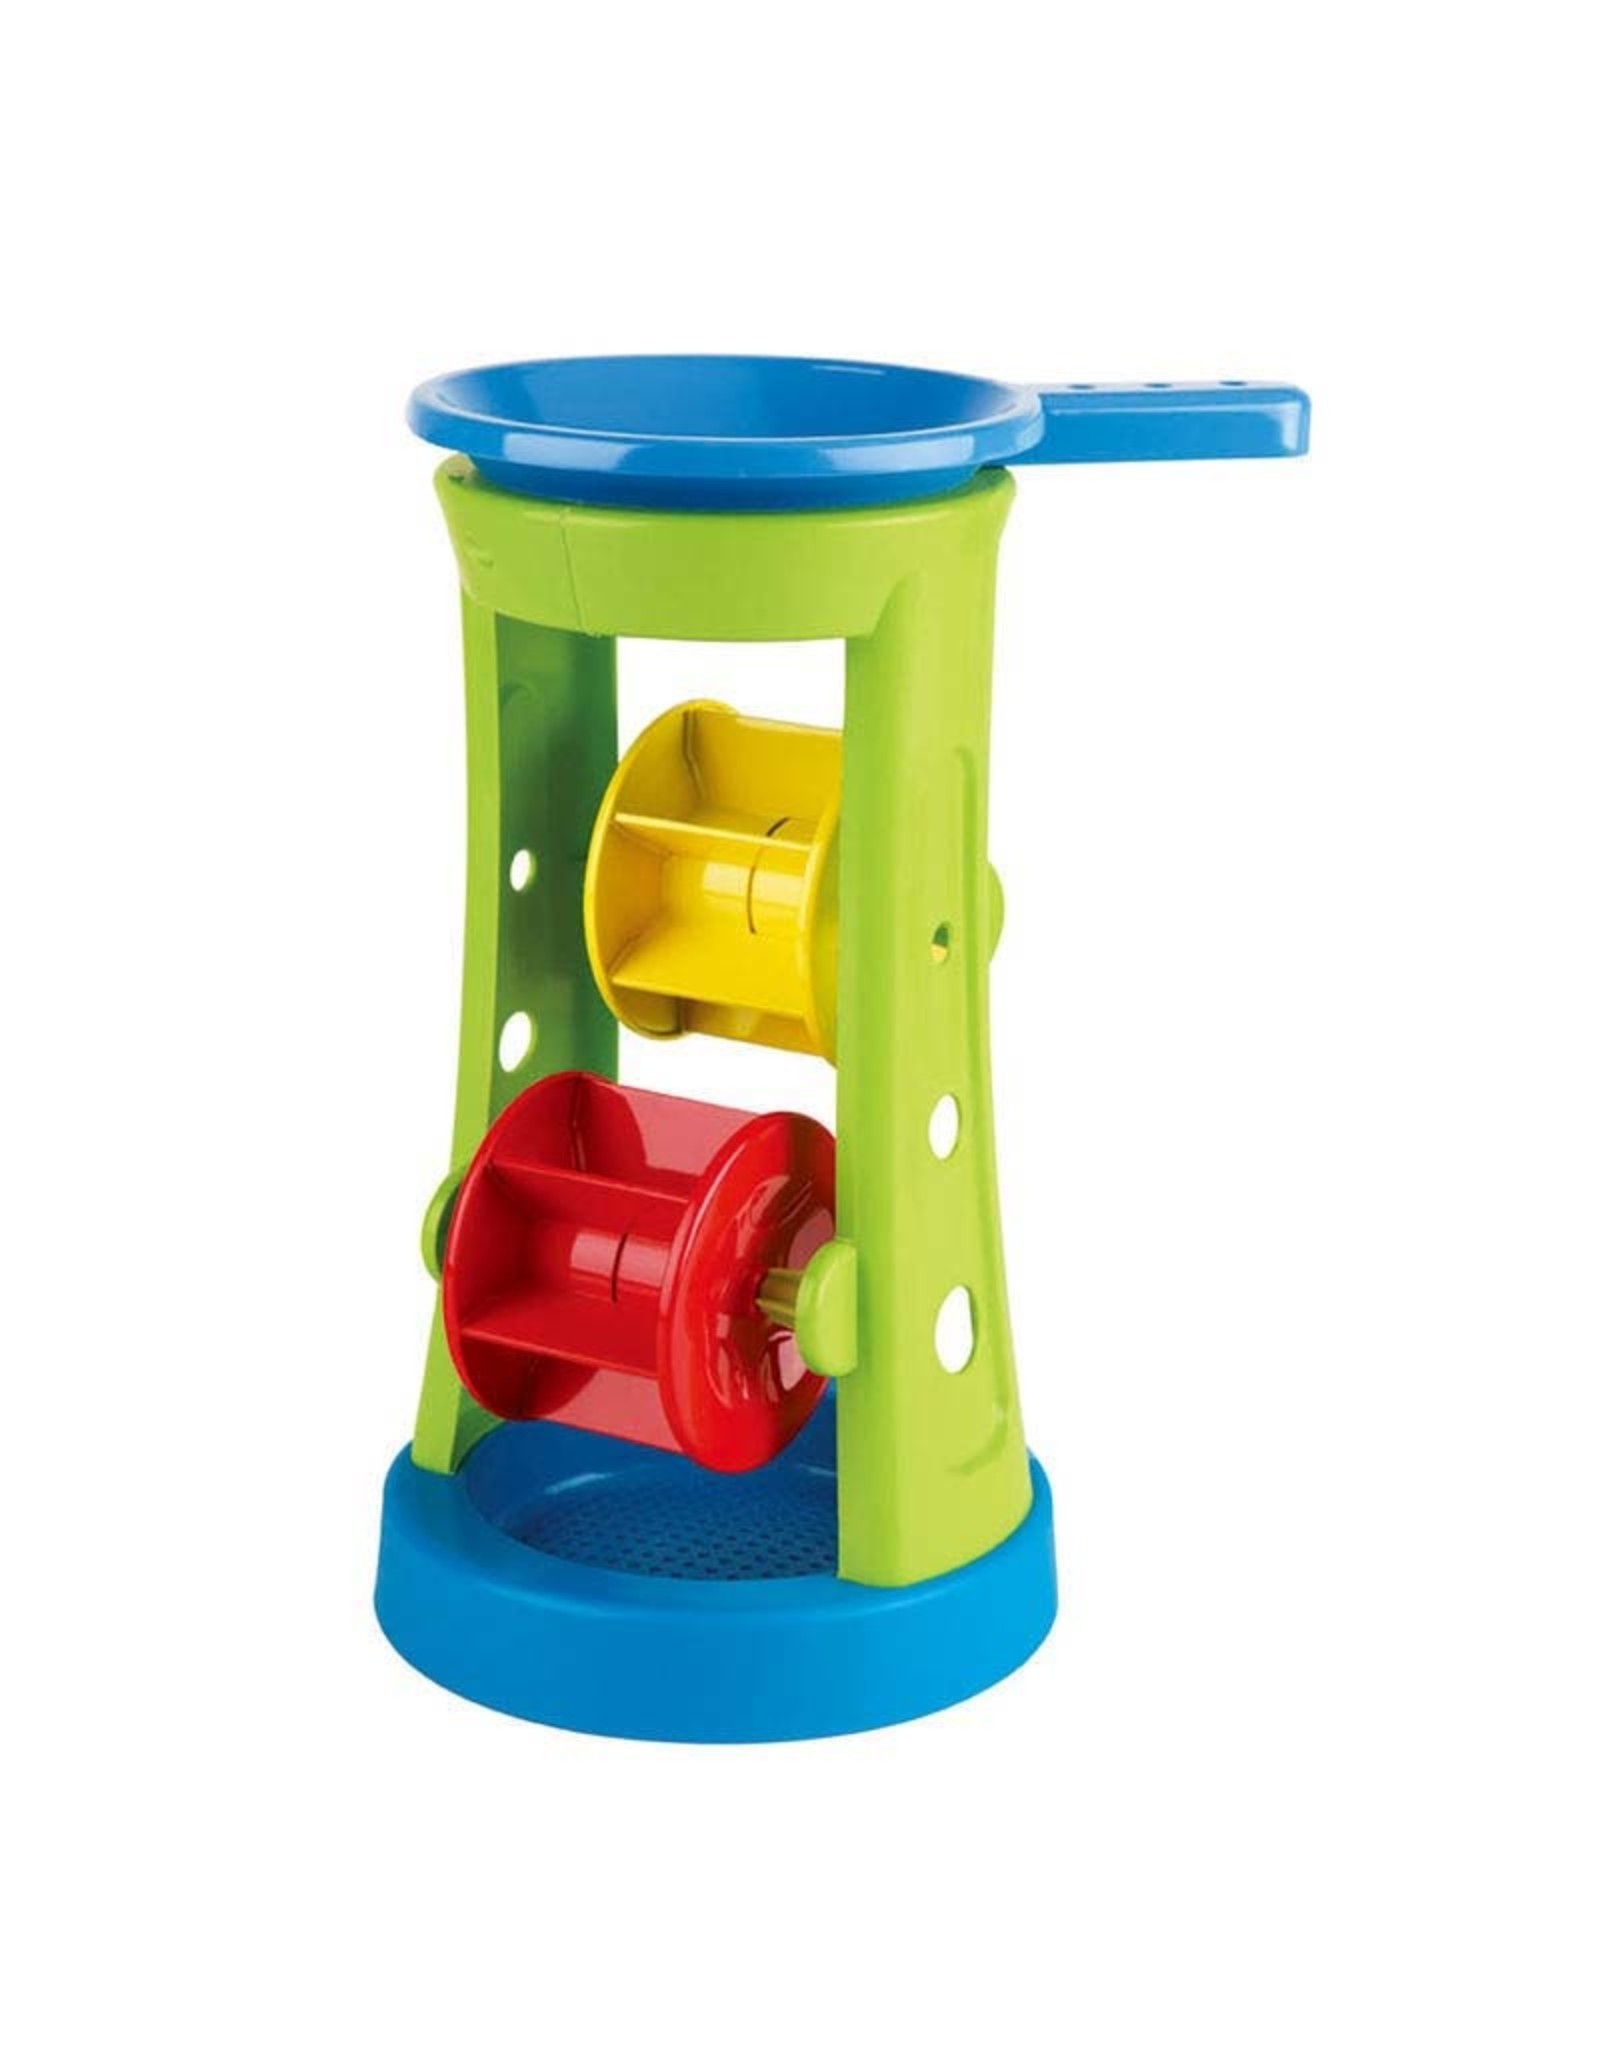 Hape Double Sand and Water Wheel